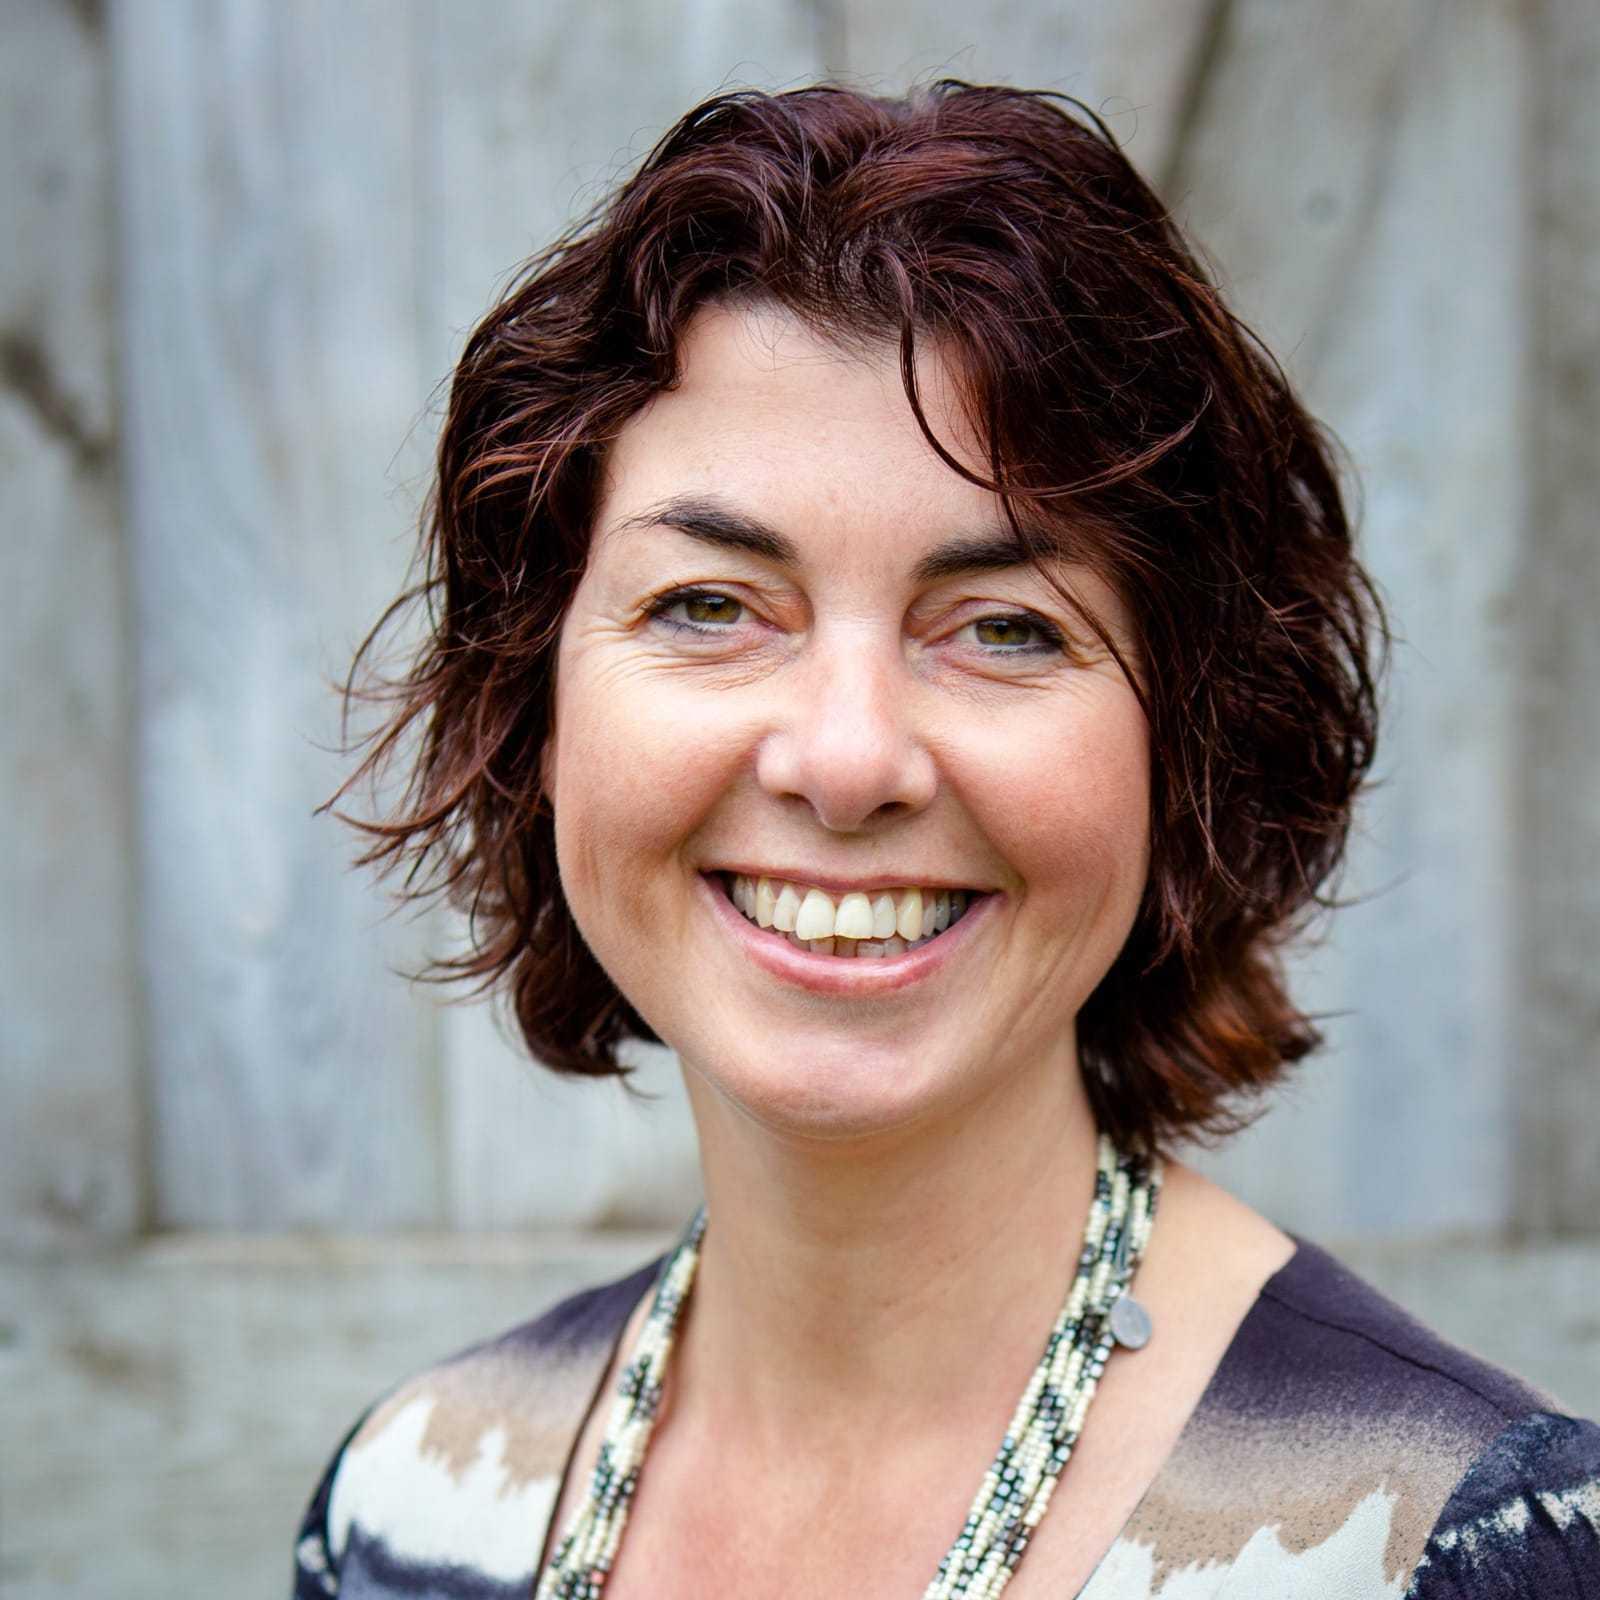 Yvonne van der Noll - Boekhouder in De Lier